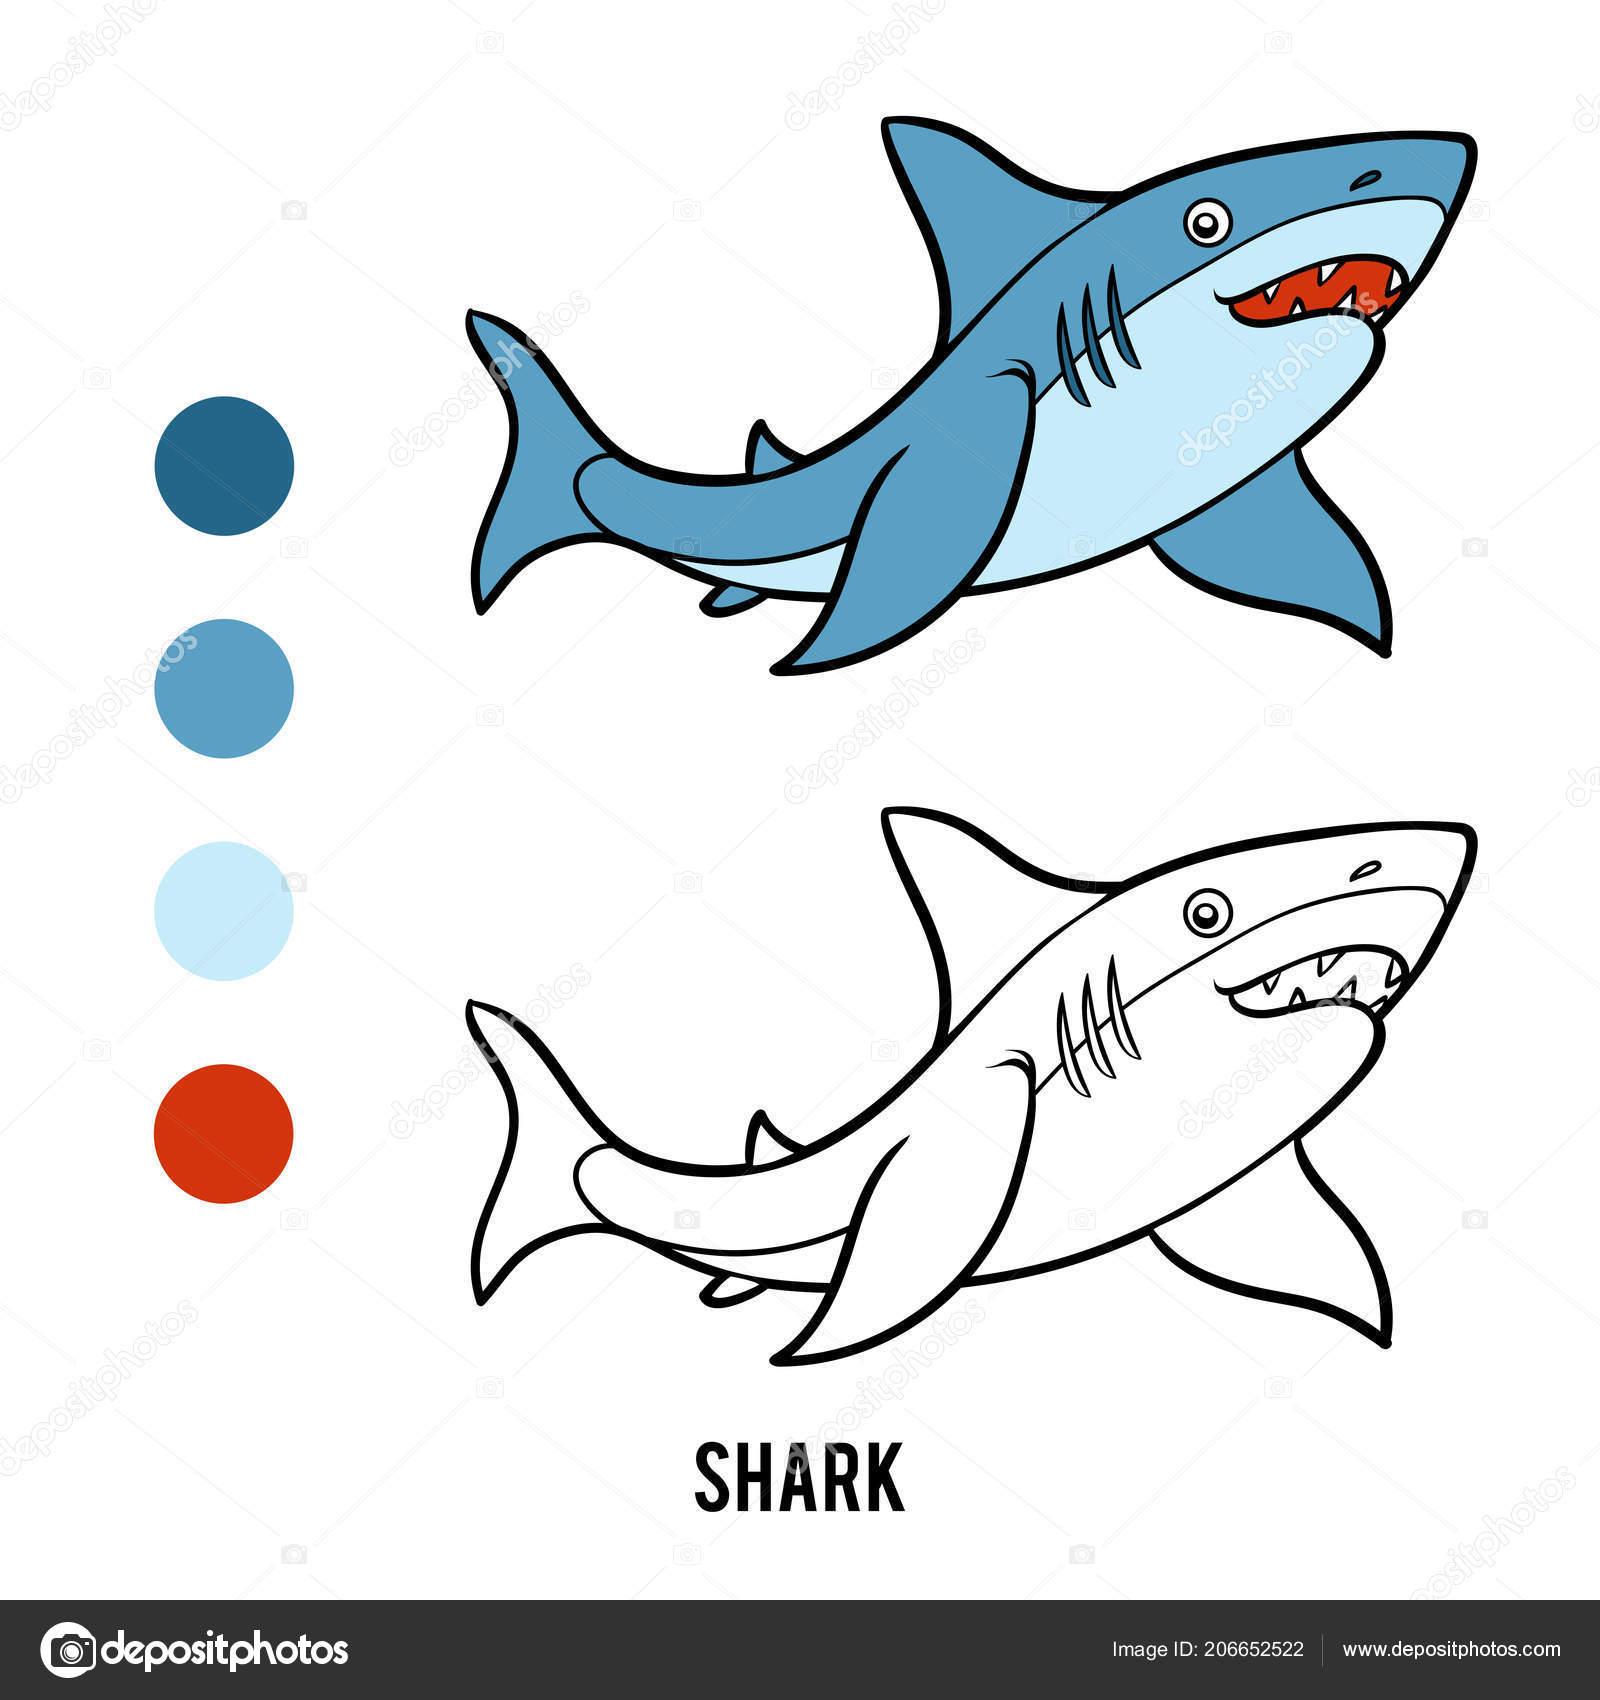 Libro Colorear Para Niños Dibujos Animados Animales